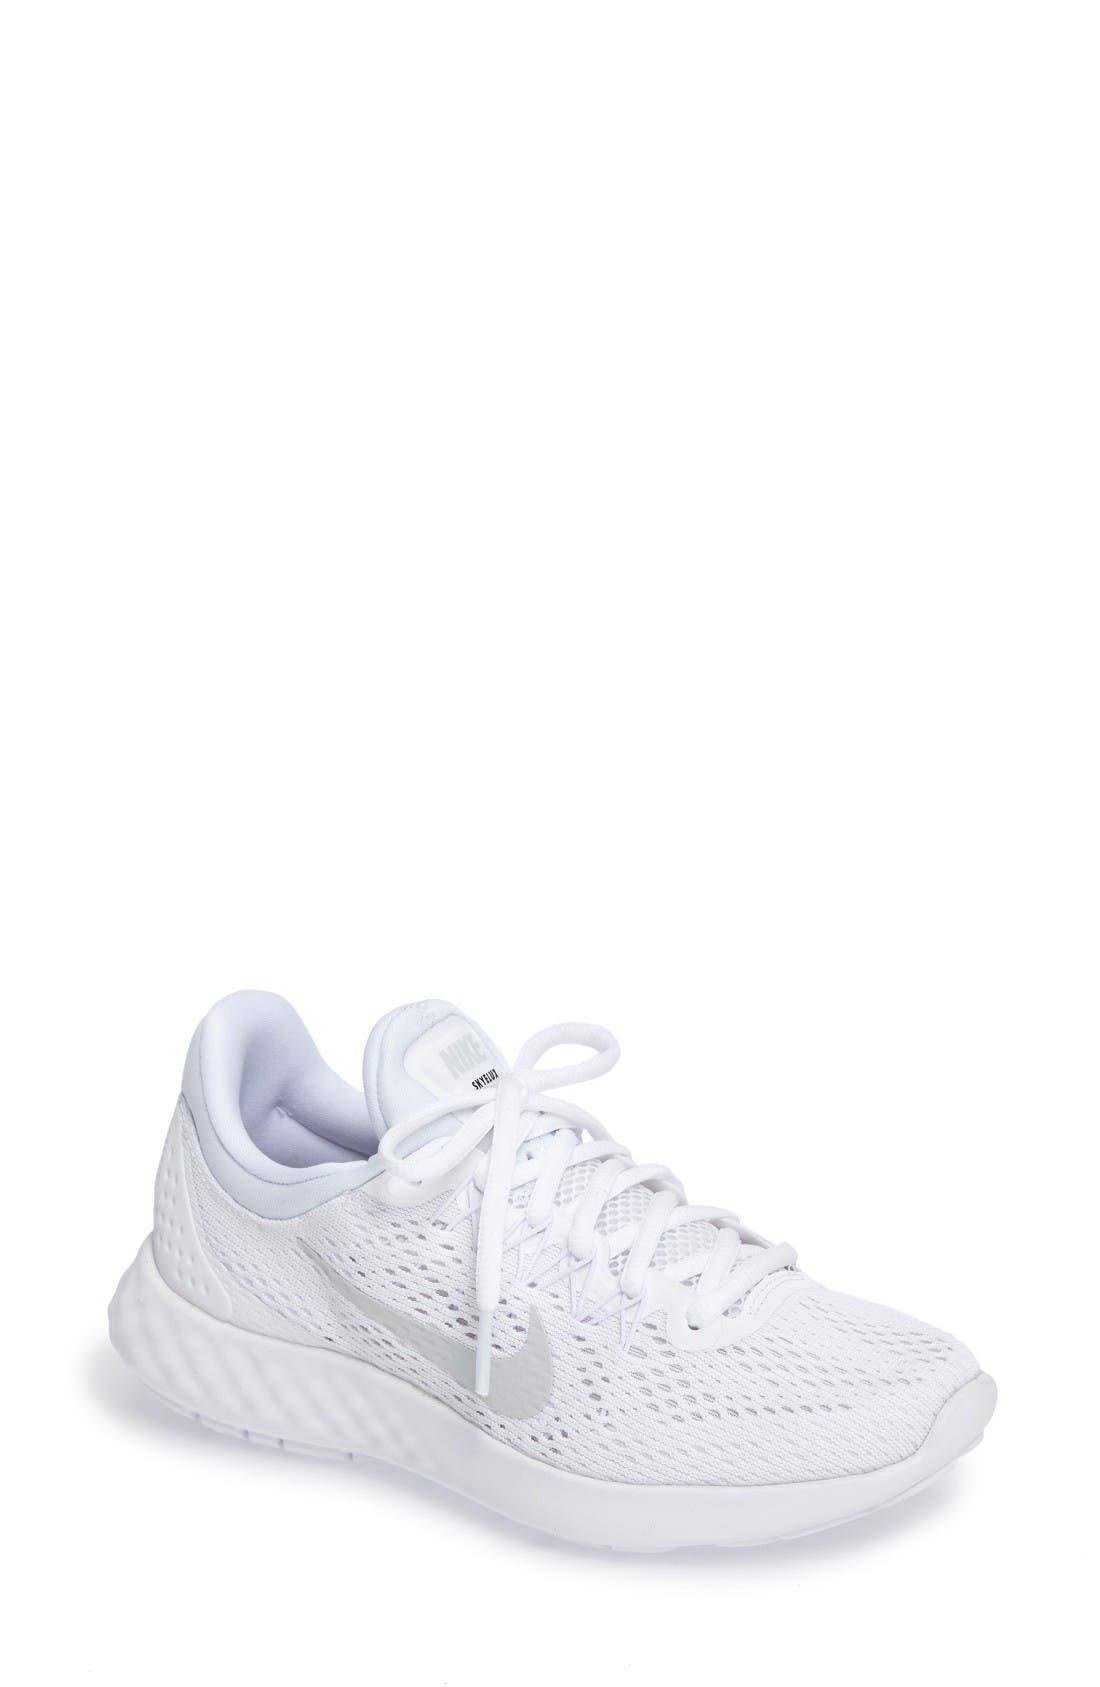 Alternate Image 1 Selected - Nike Lunar Skyelux Running Shoe (Women)